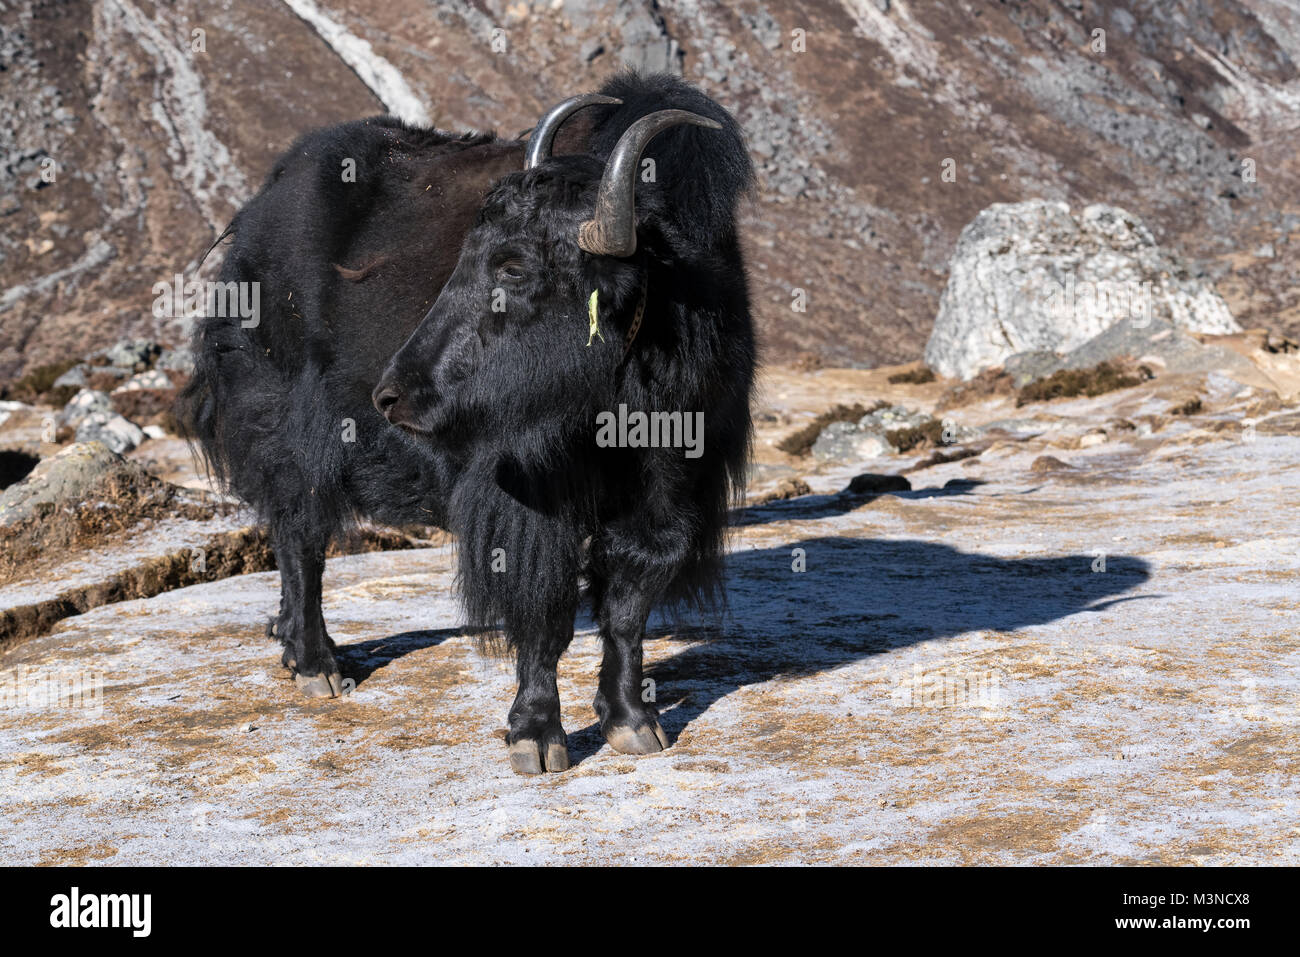 Yak animal in the Nepalese mountains, Nepal - Stock Image